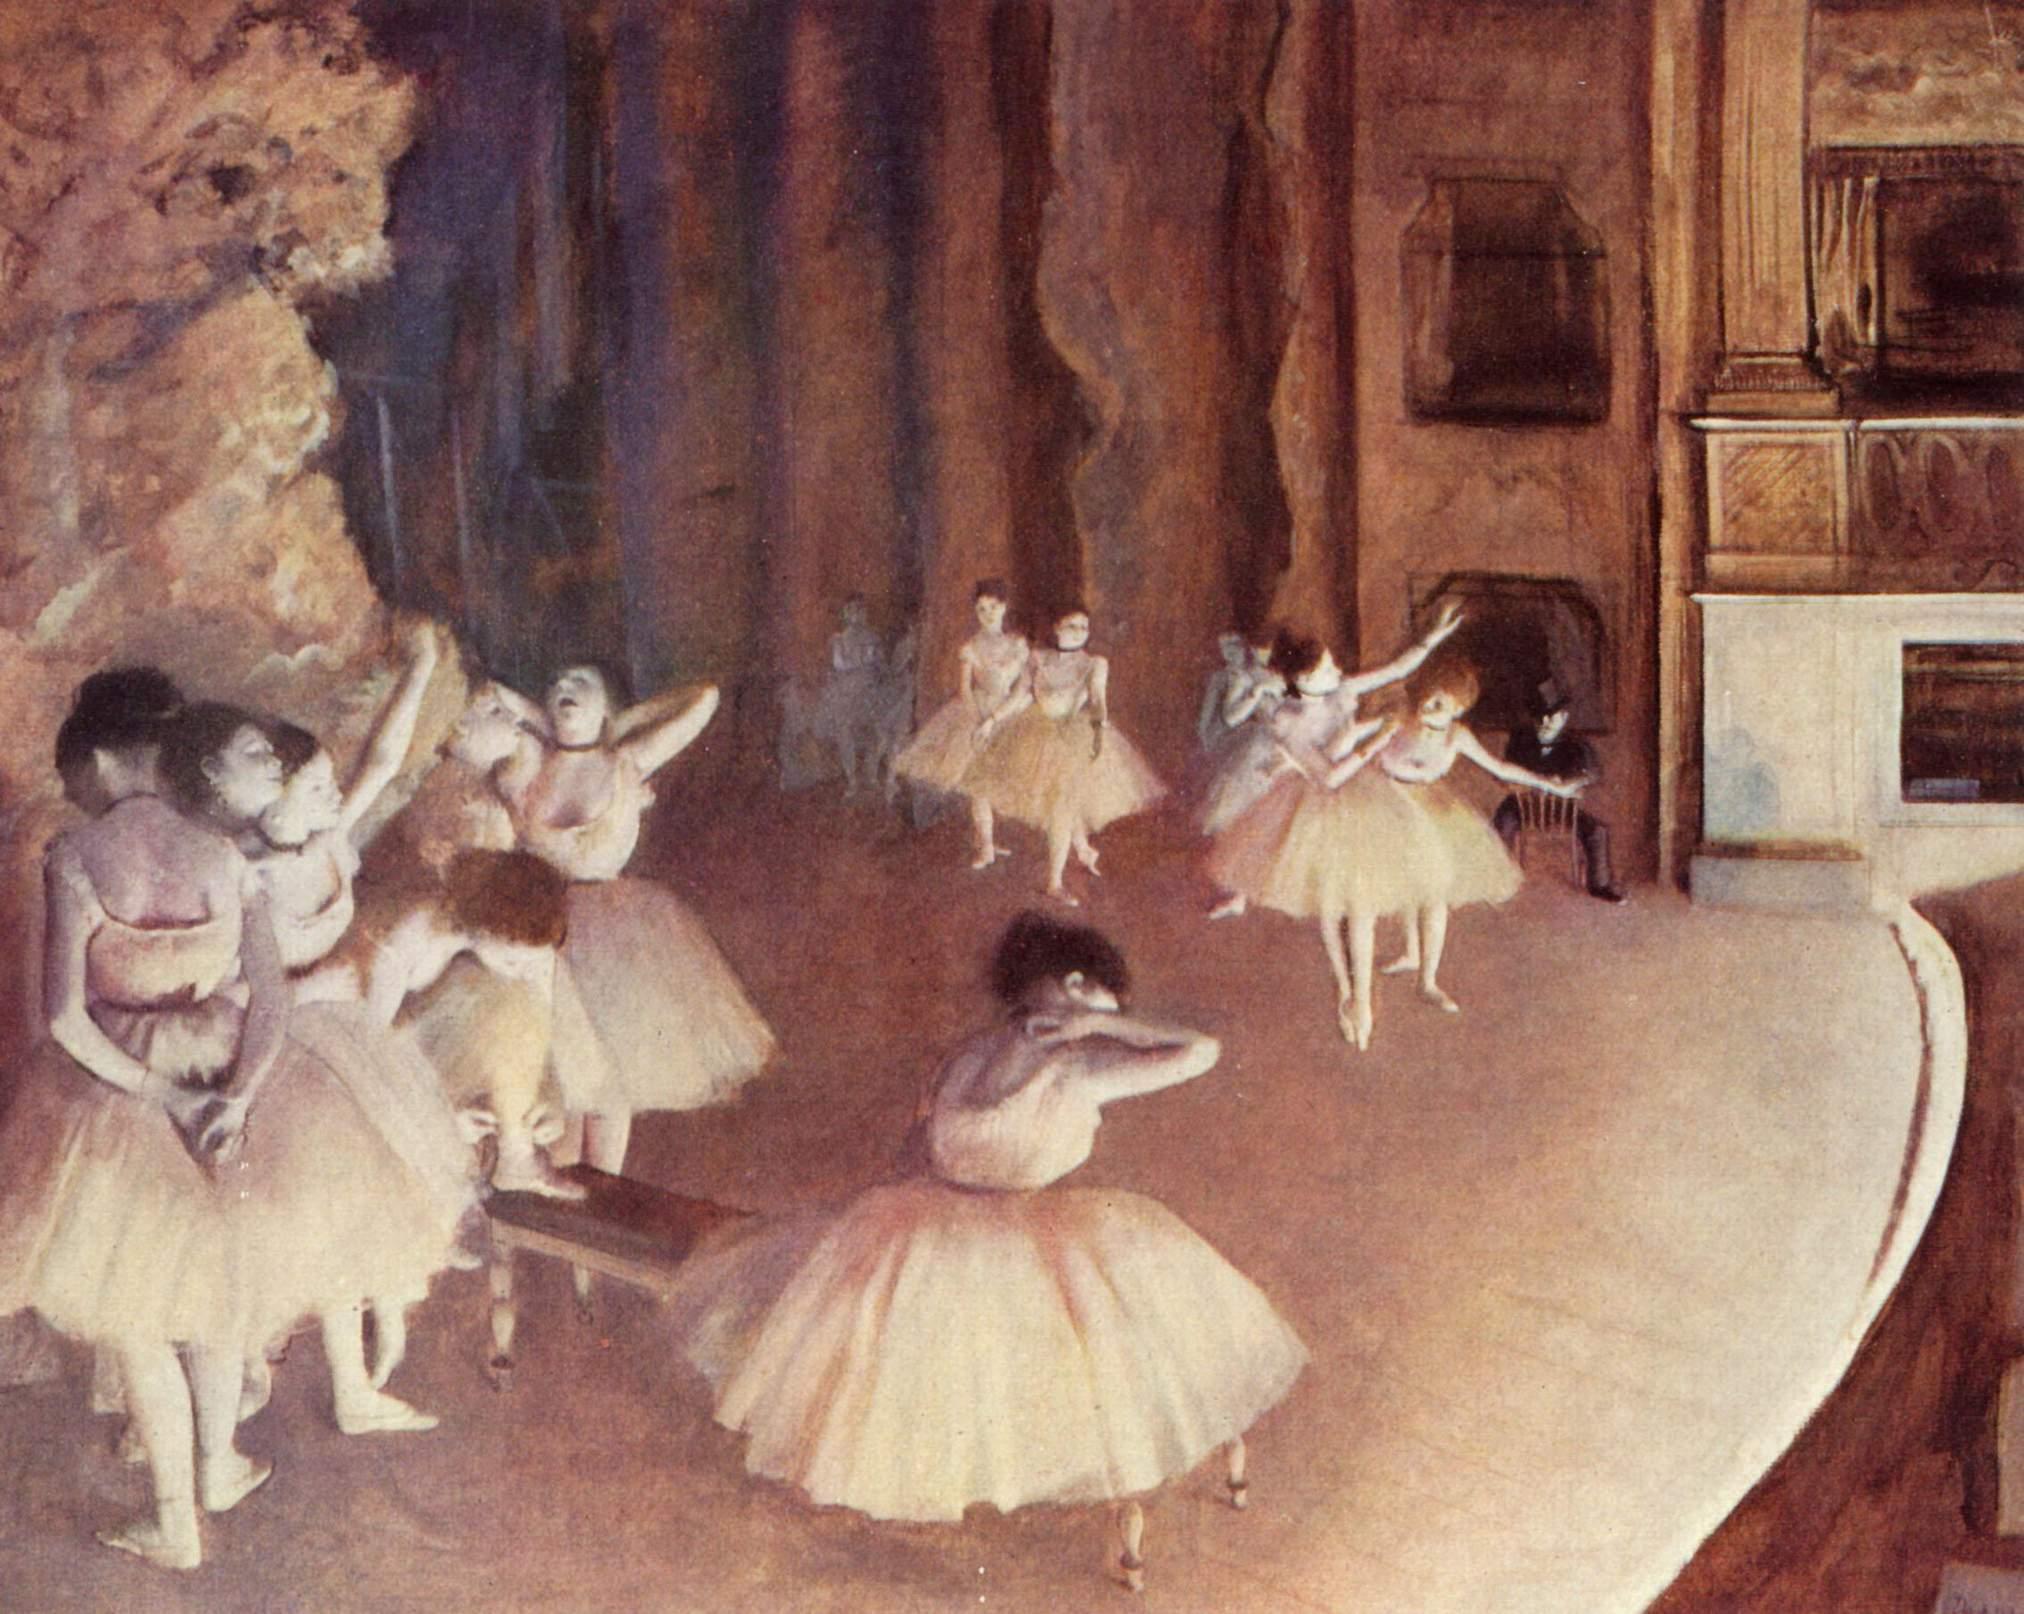 Генеральная репетиция балета на сцене, Эдгар-Жермен - Илер Дега